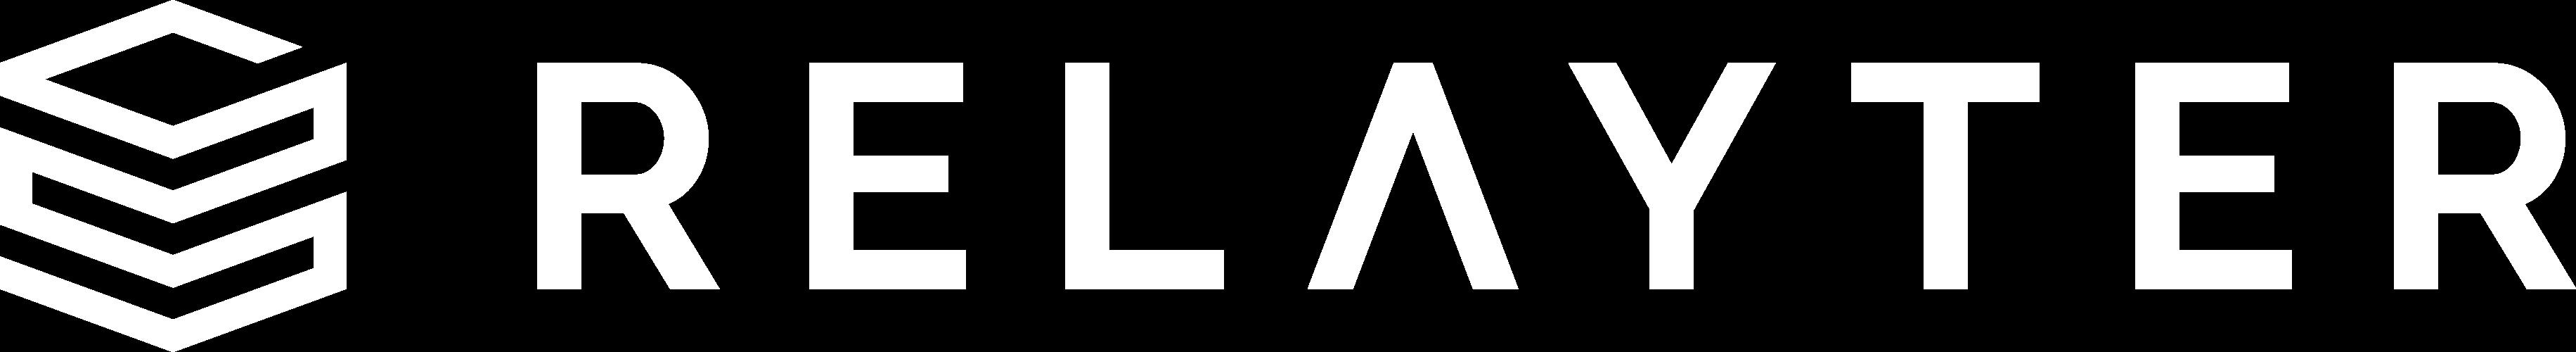 Relayter-Logo-White